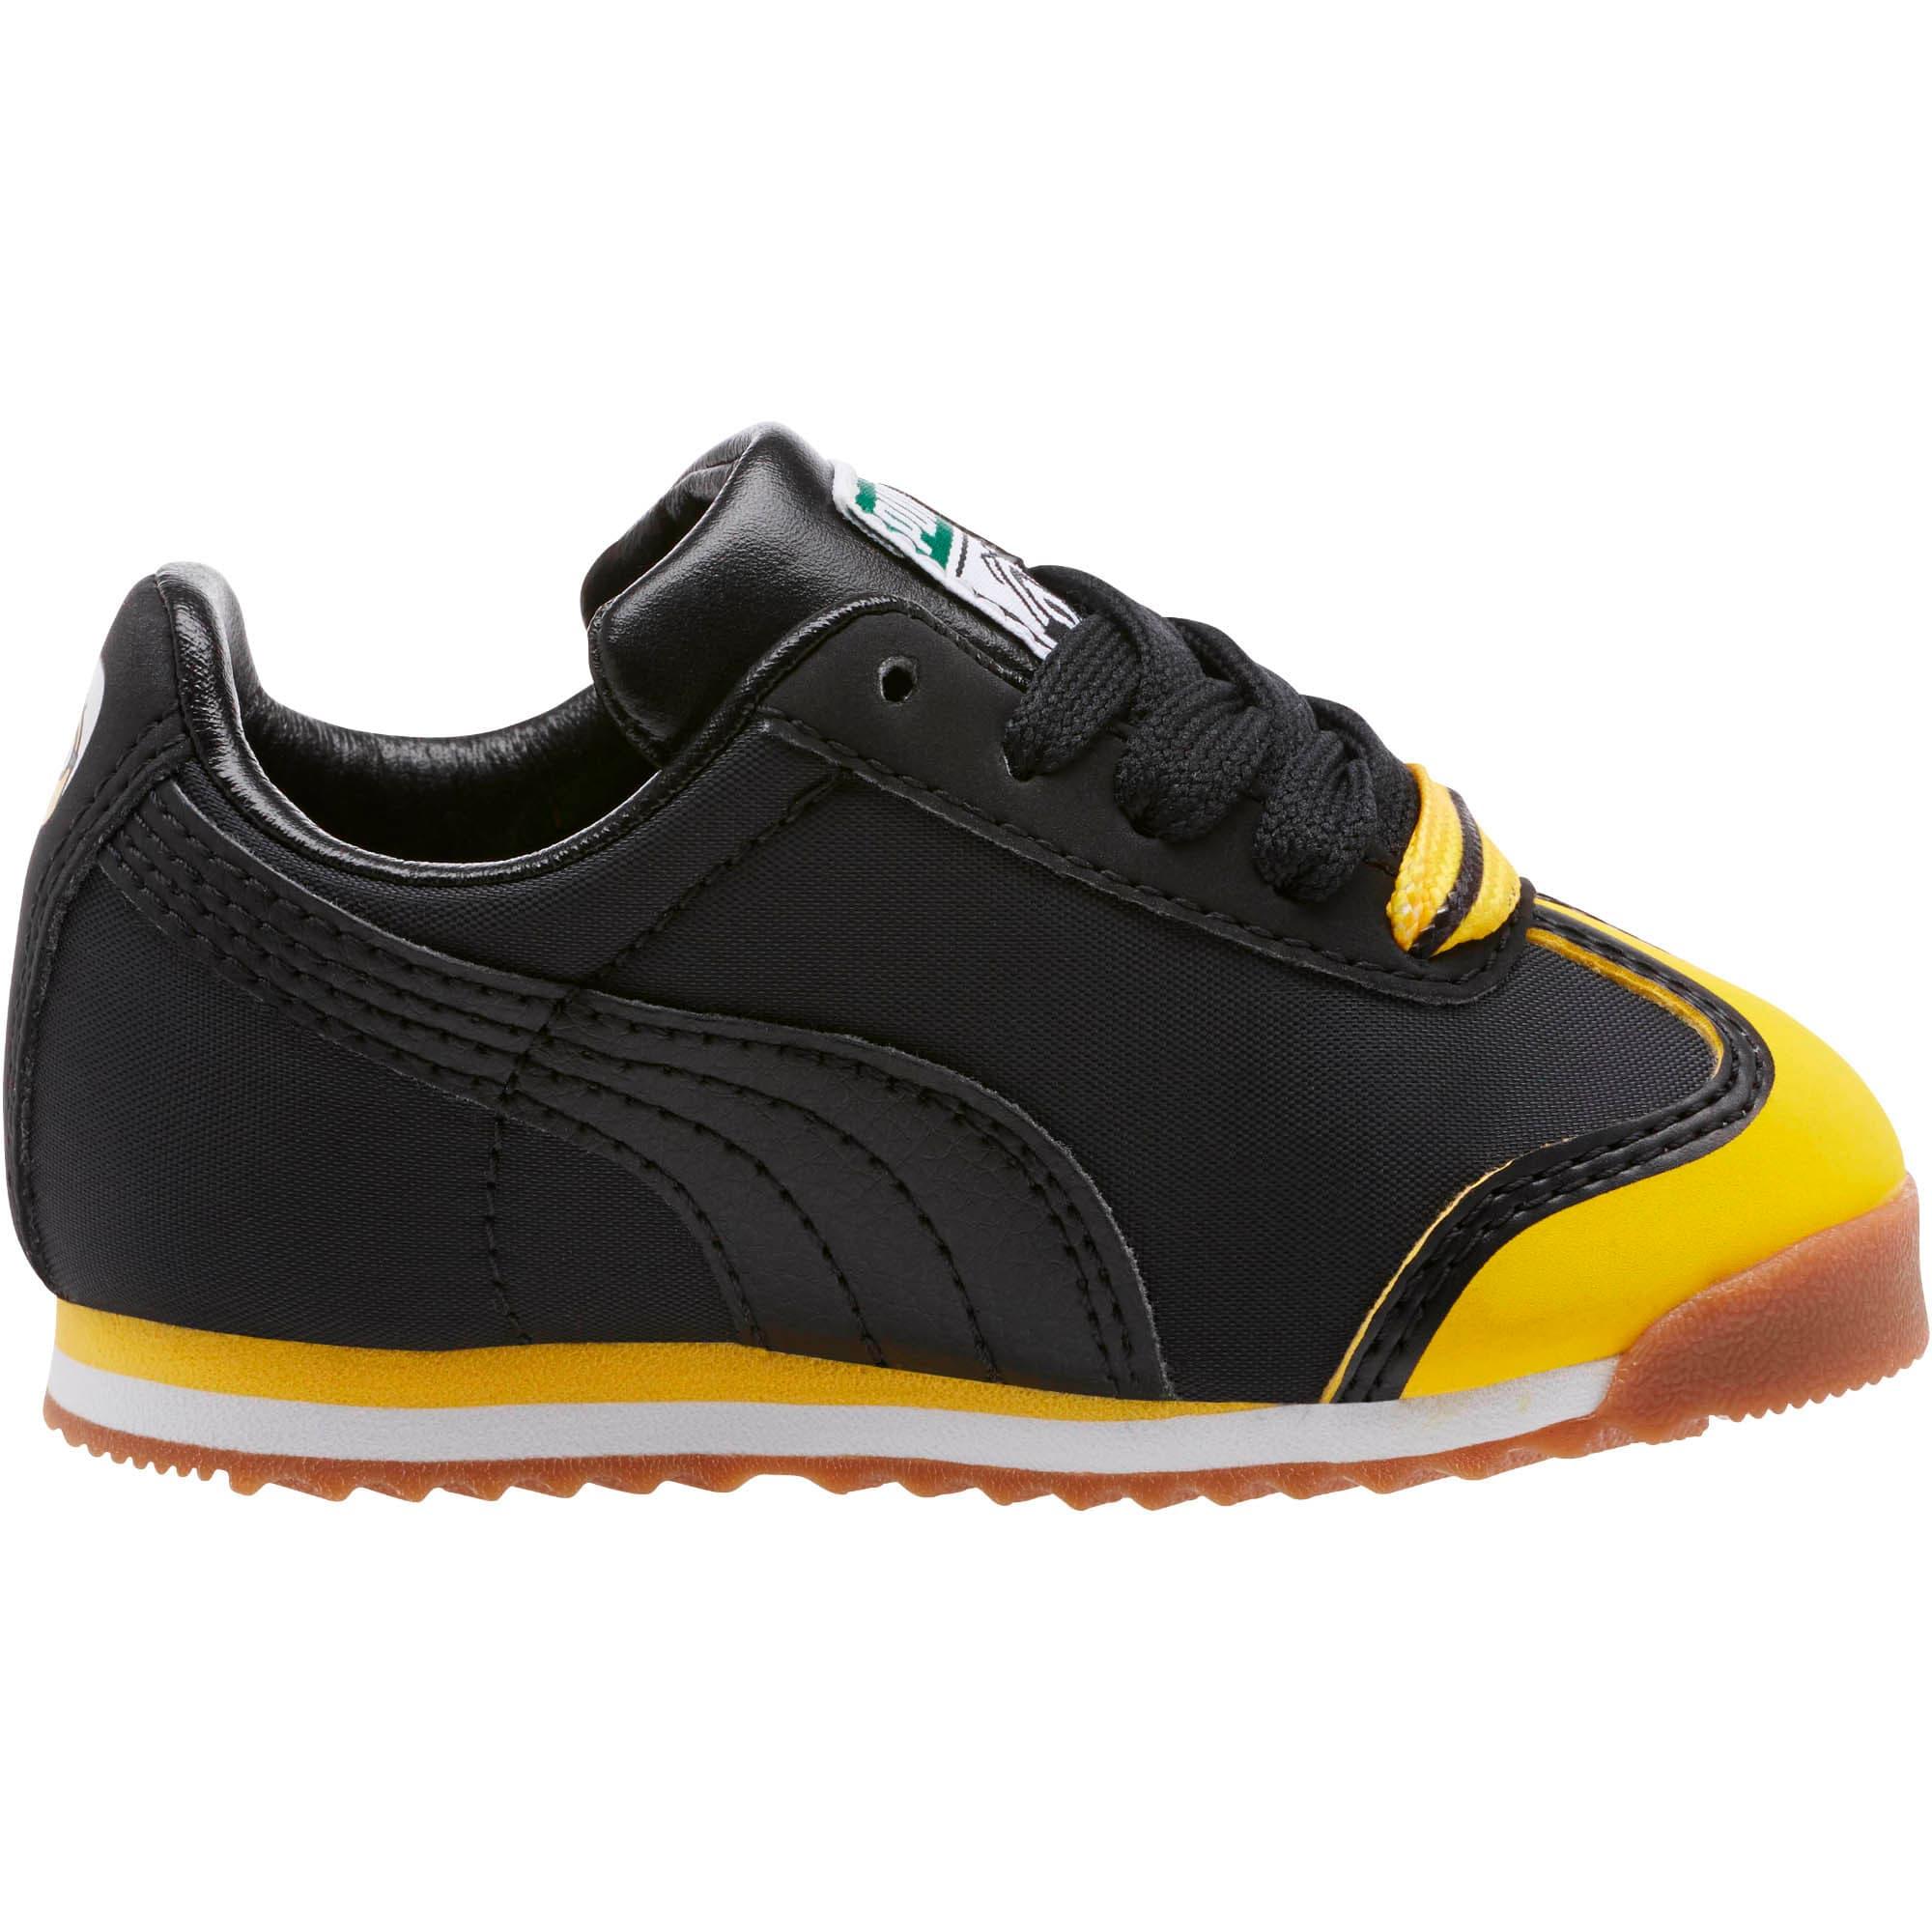 Thumbnail 3 of Minions Roma Toddler Shoes, Black-Minion Yellow-Black, medium